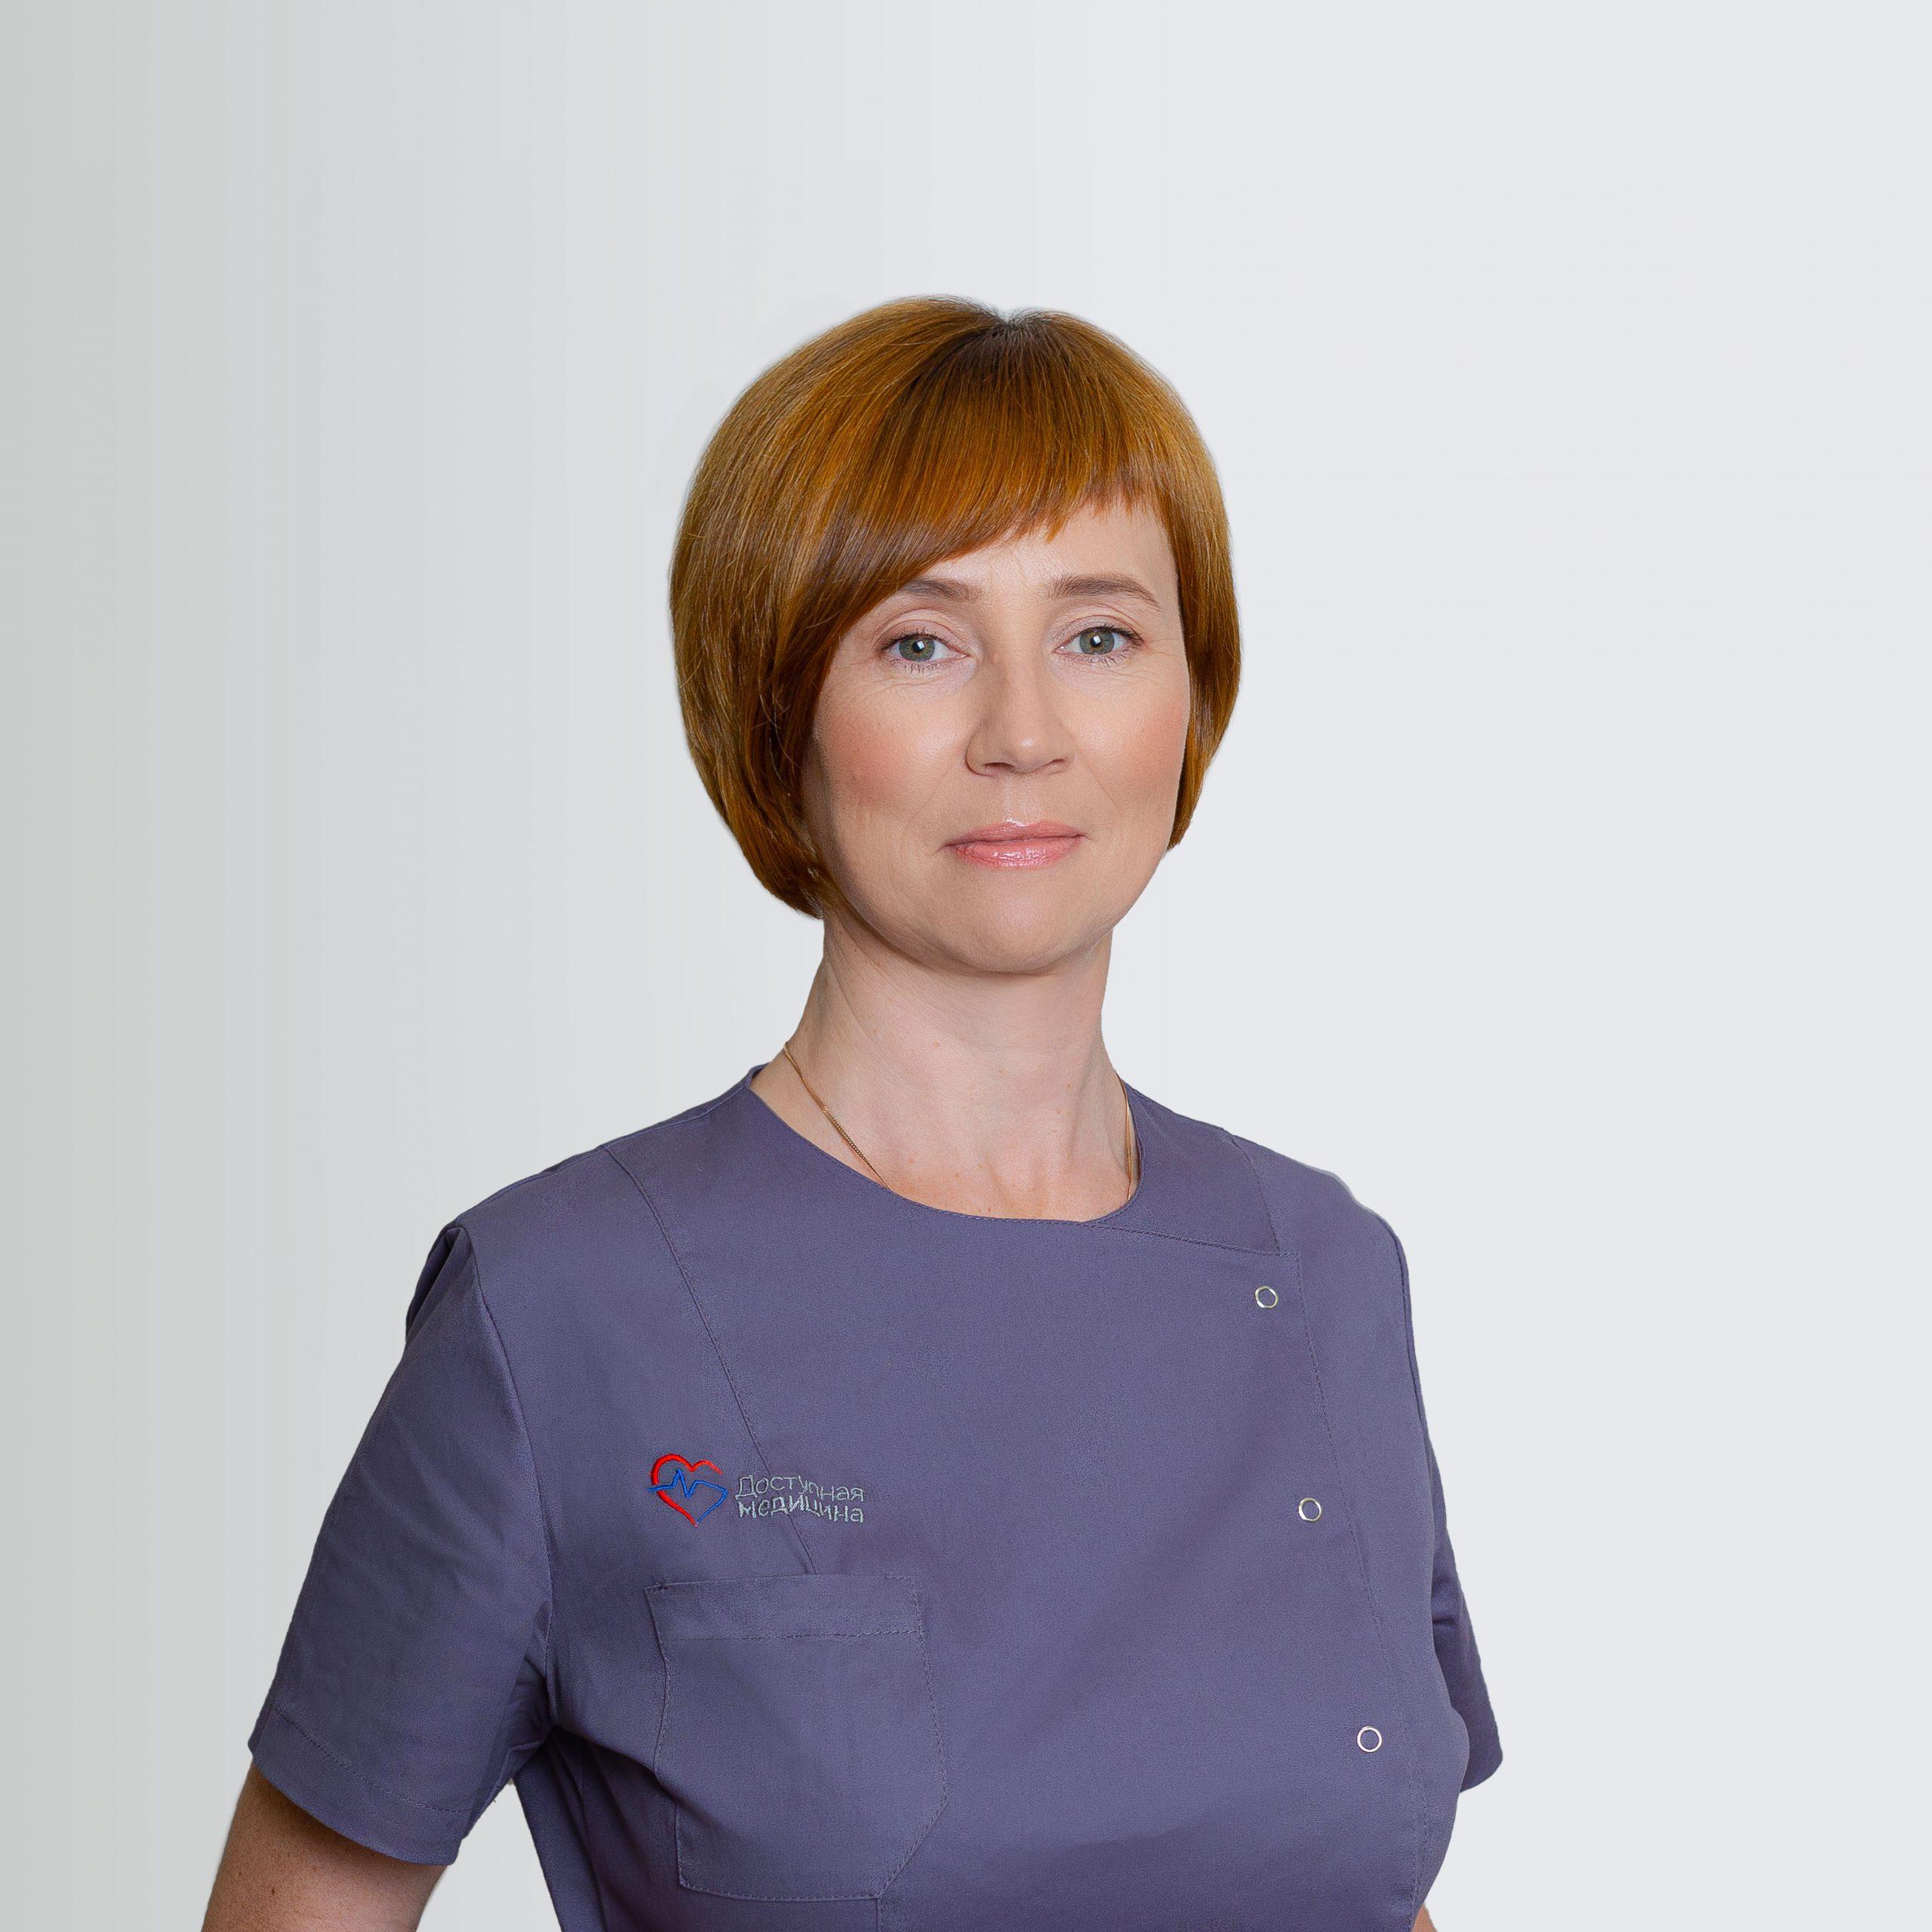 Жданова Екатерина Васильевна